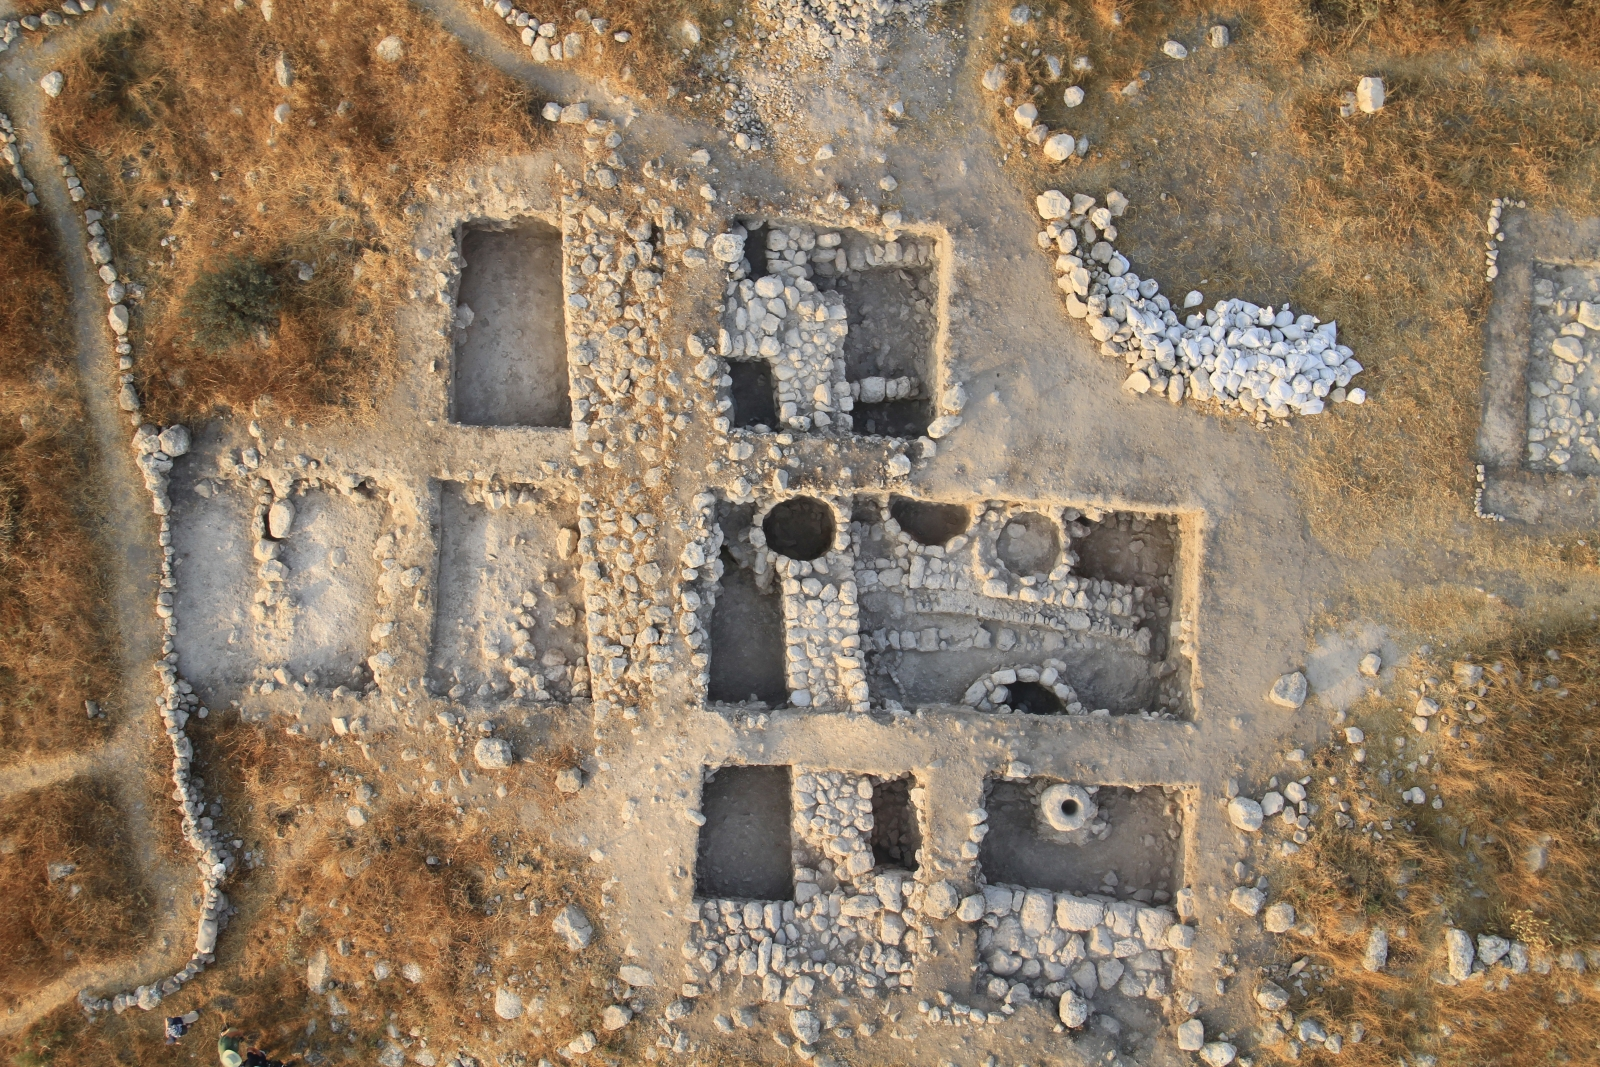 israel biblical libnah iron age settlement from kingdom of judah